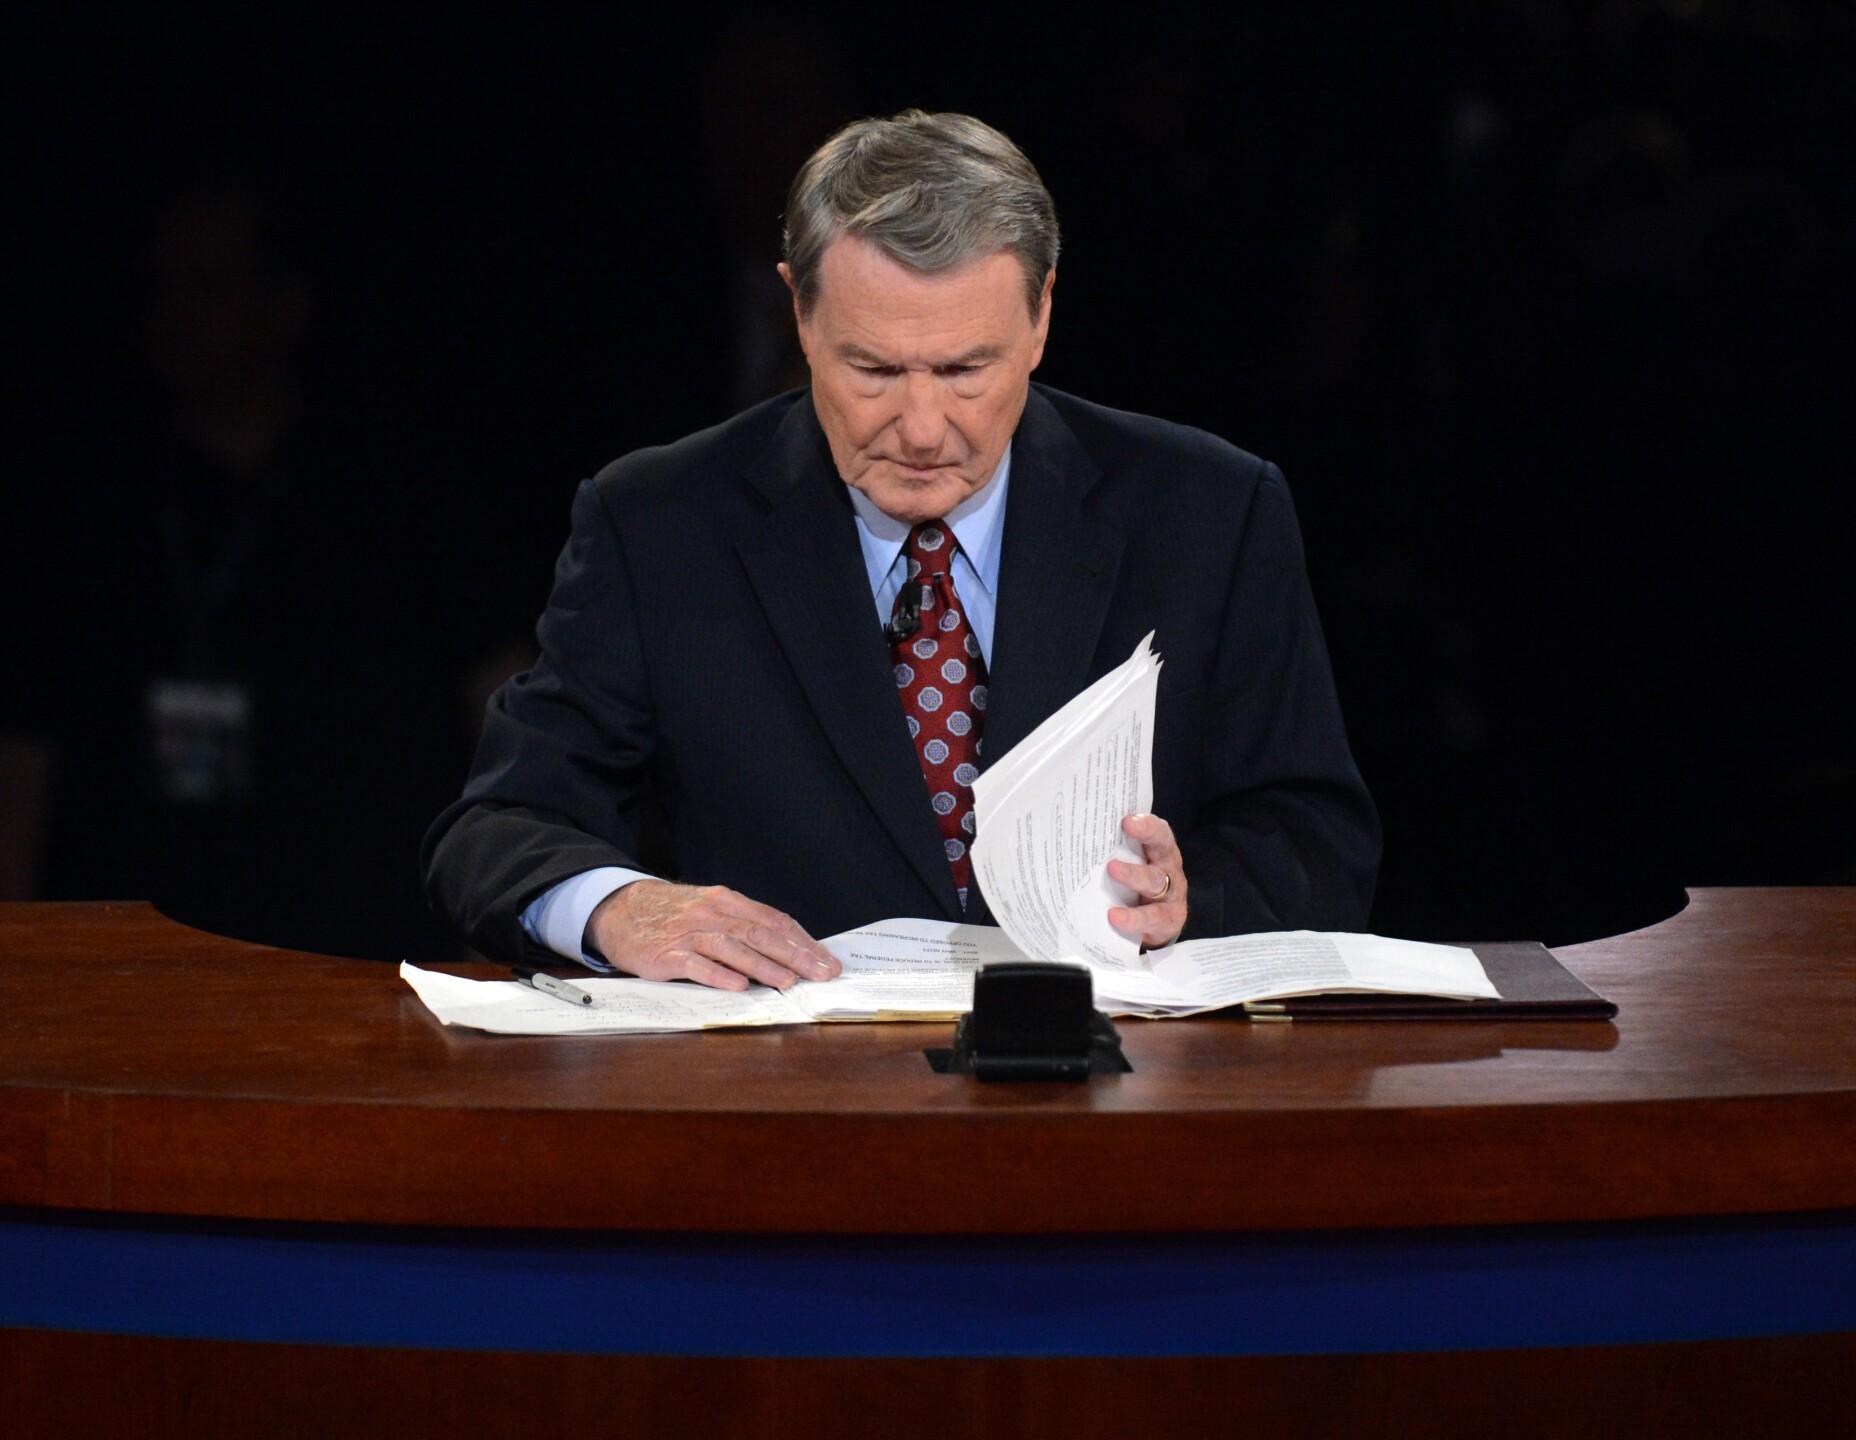 Photos: Longtime PBS NewsHour anchor Jim Lehrer dies at85